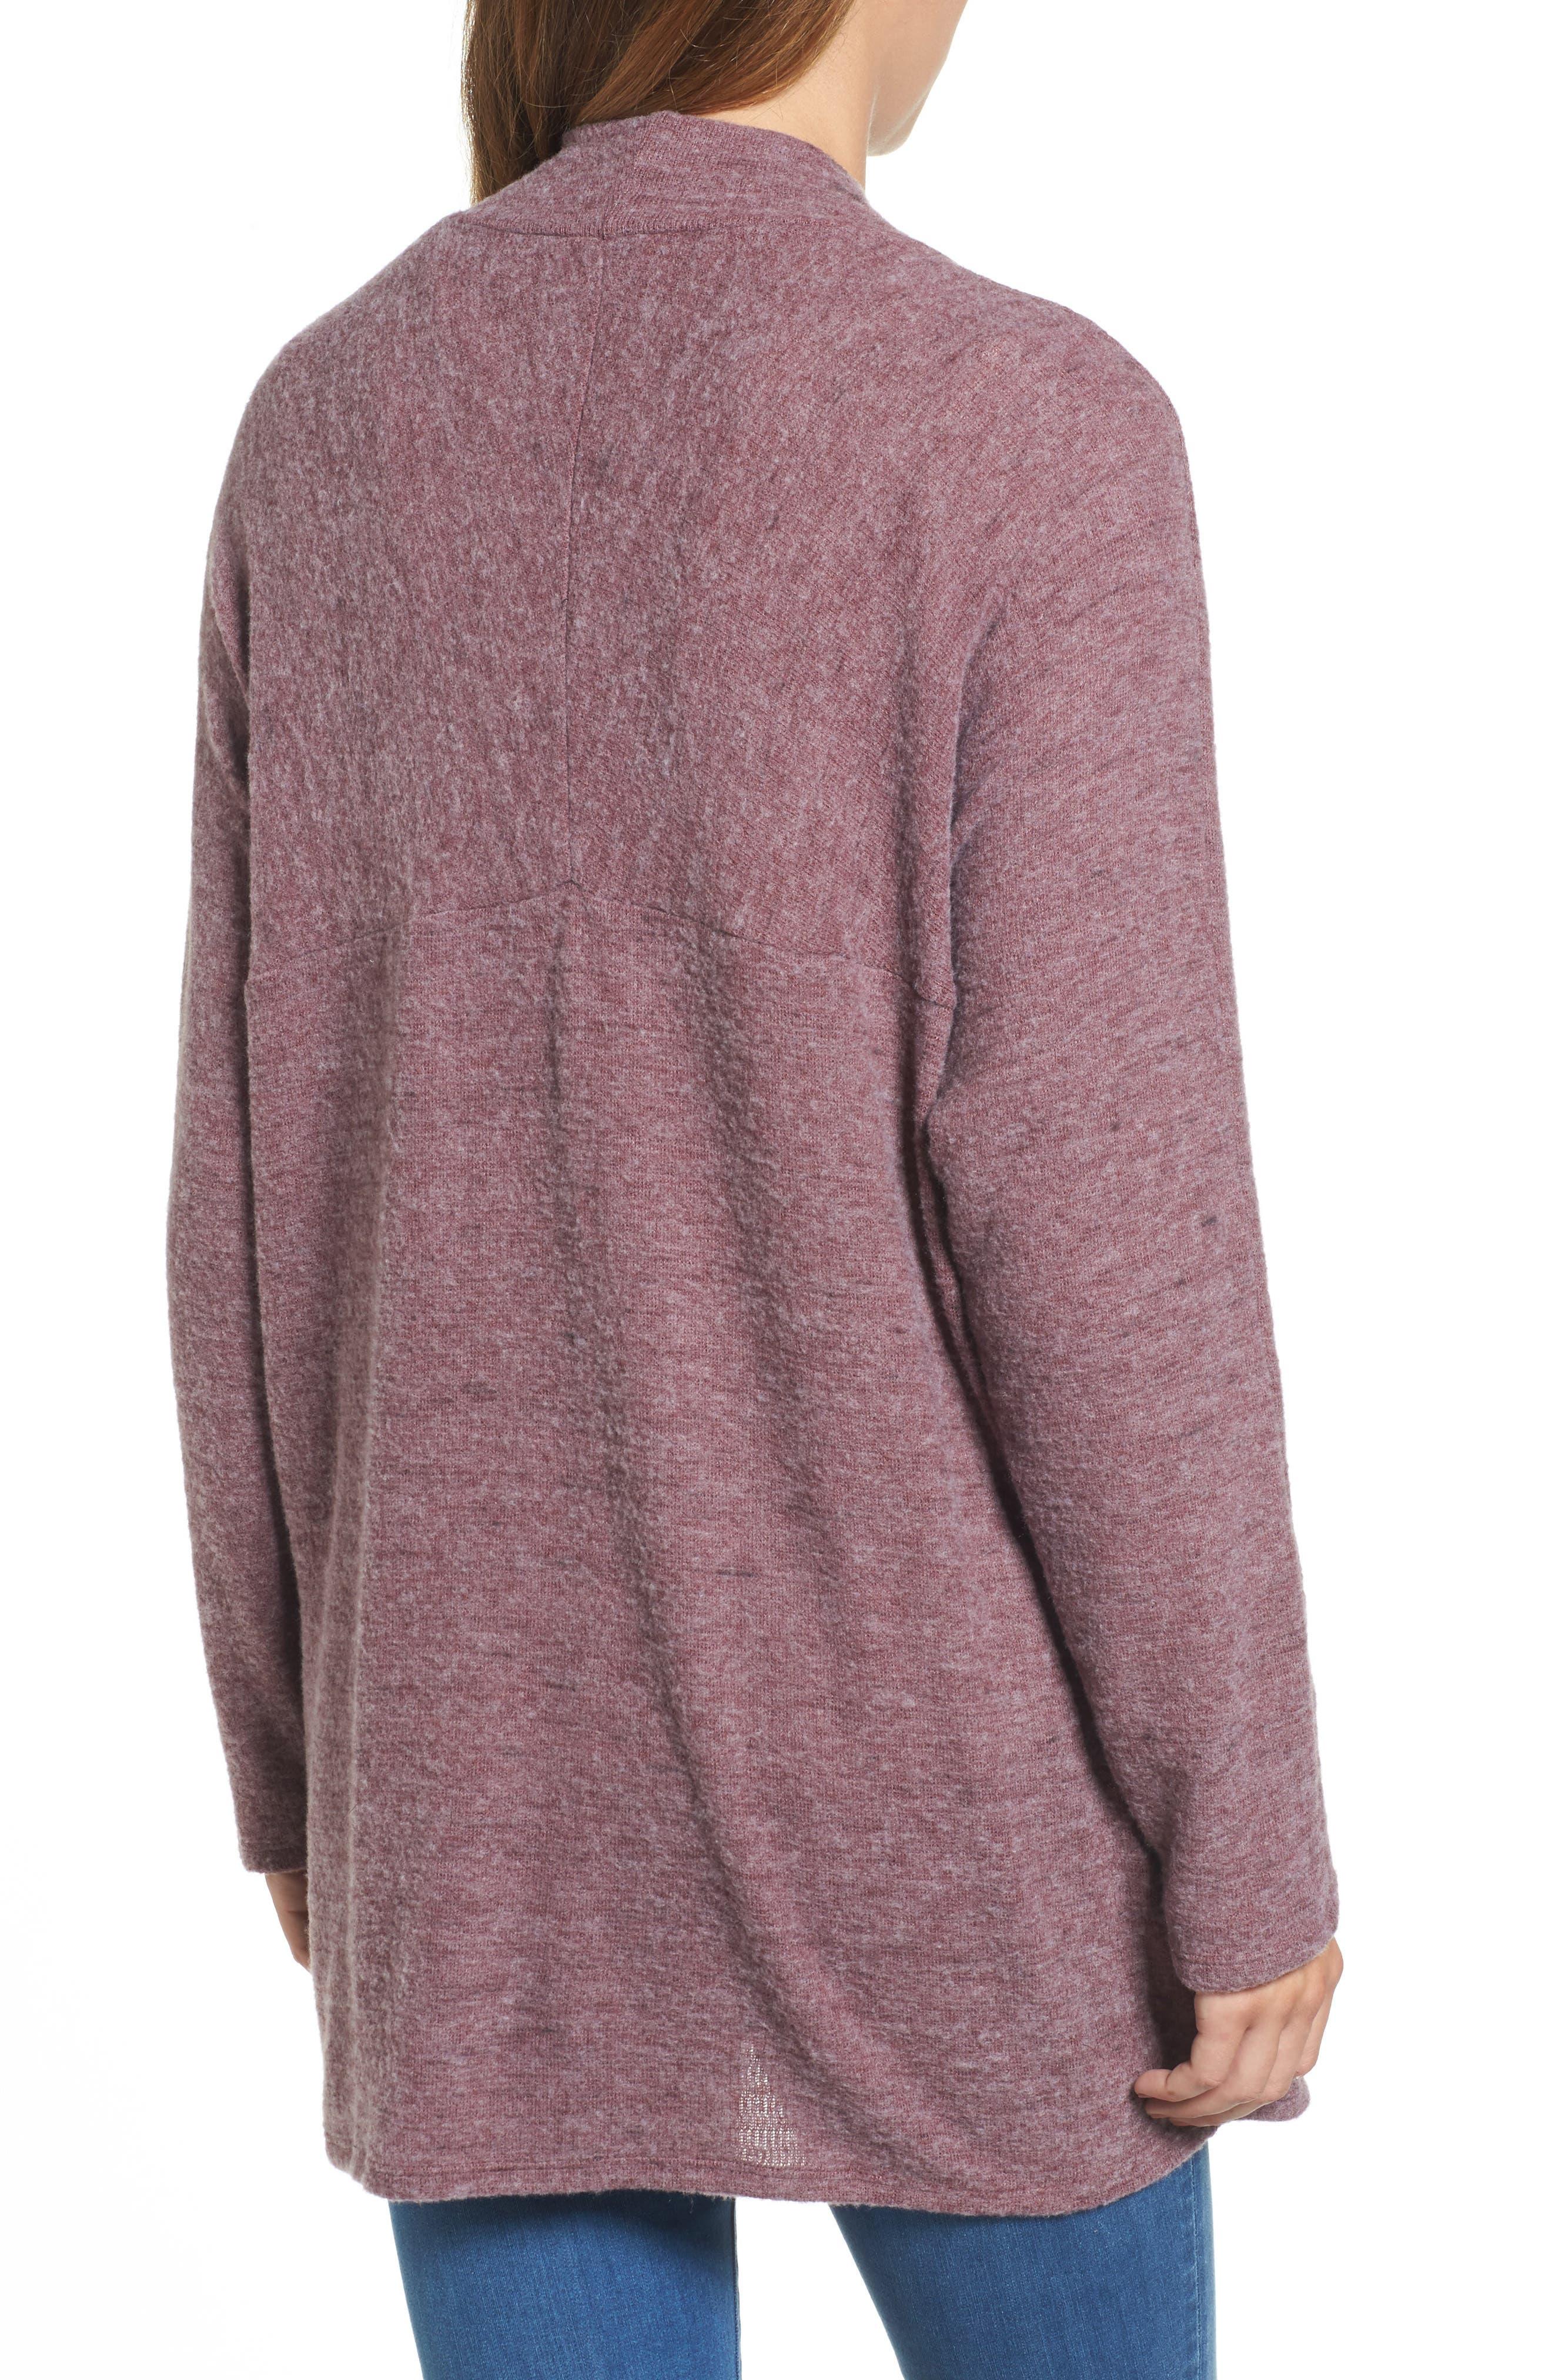 Caslon Open Knit Cardigan,                             Alternate thumbnail 10, color,